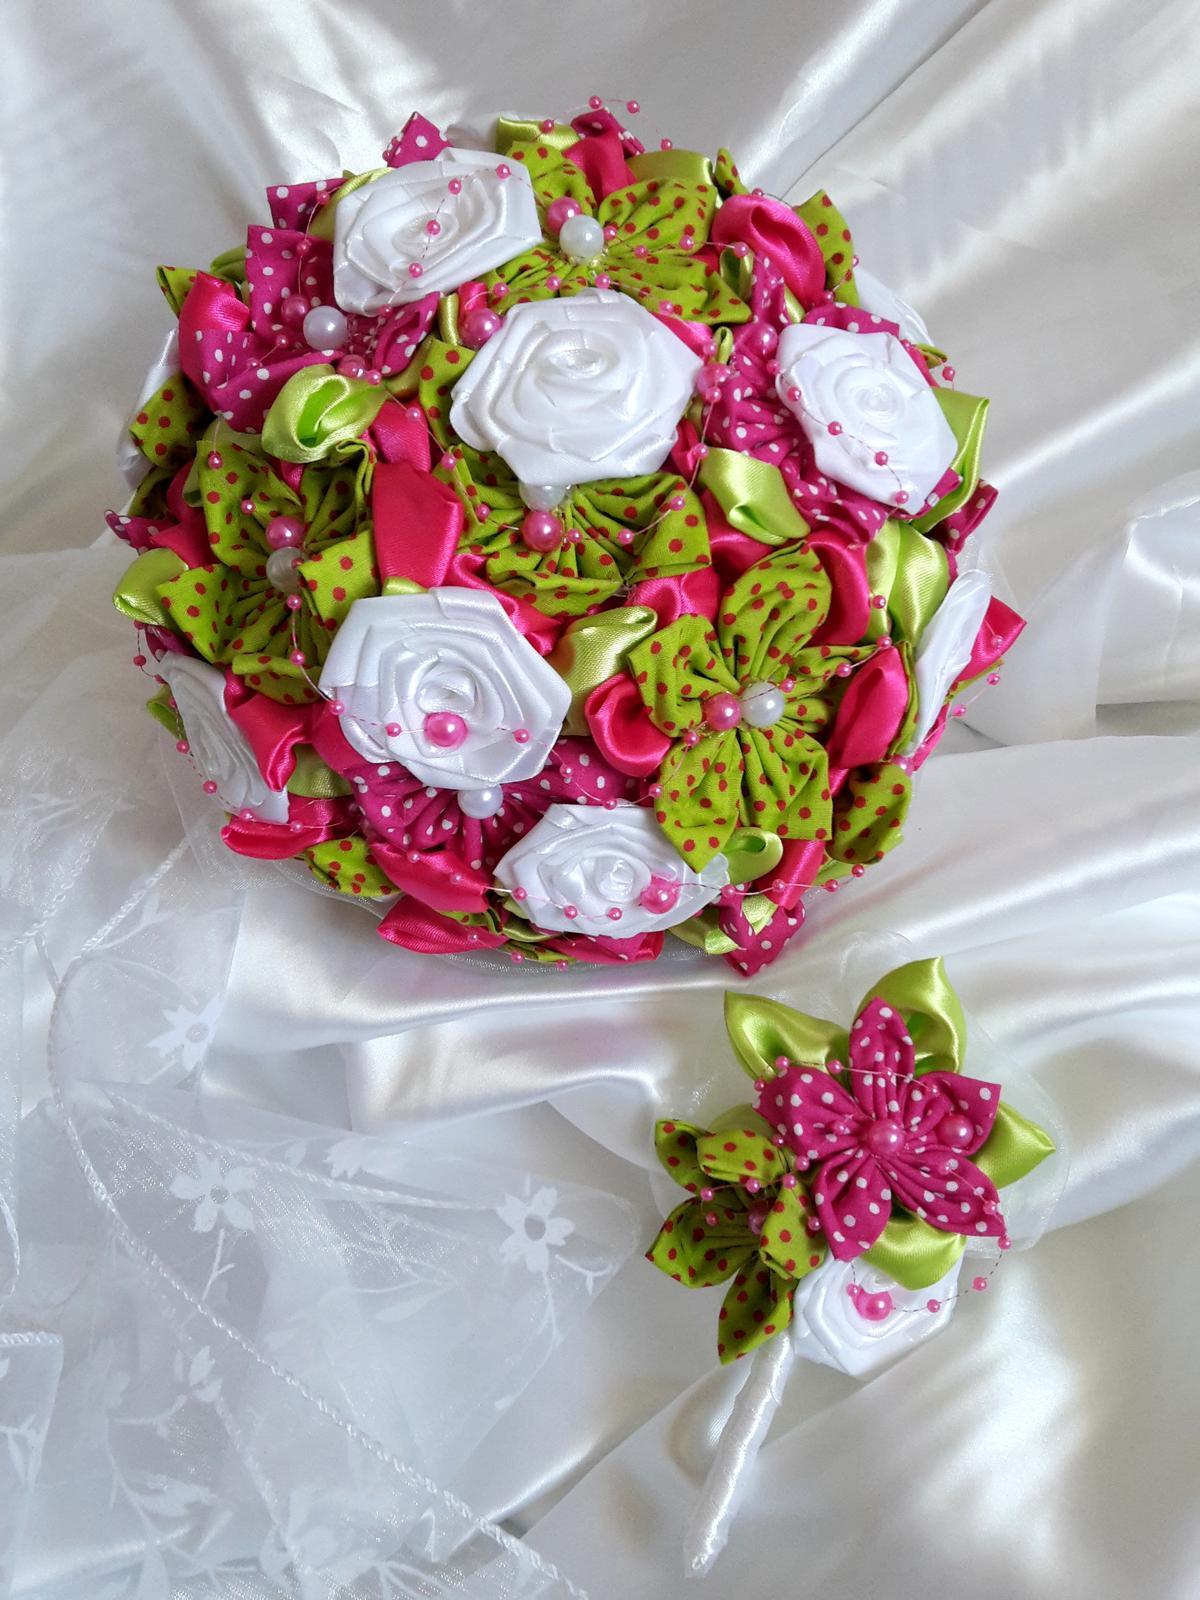 Veselá bodkovaná svadba - Obrázok č. 1